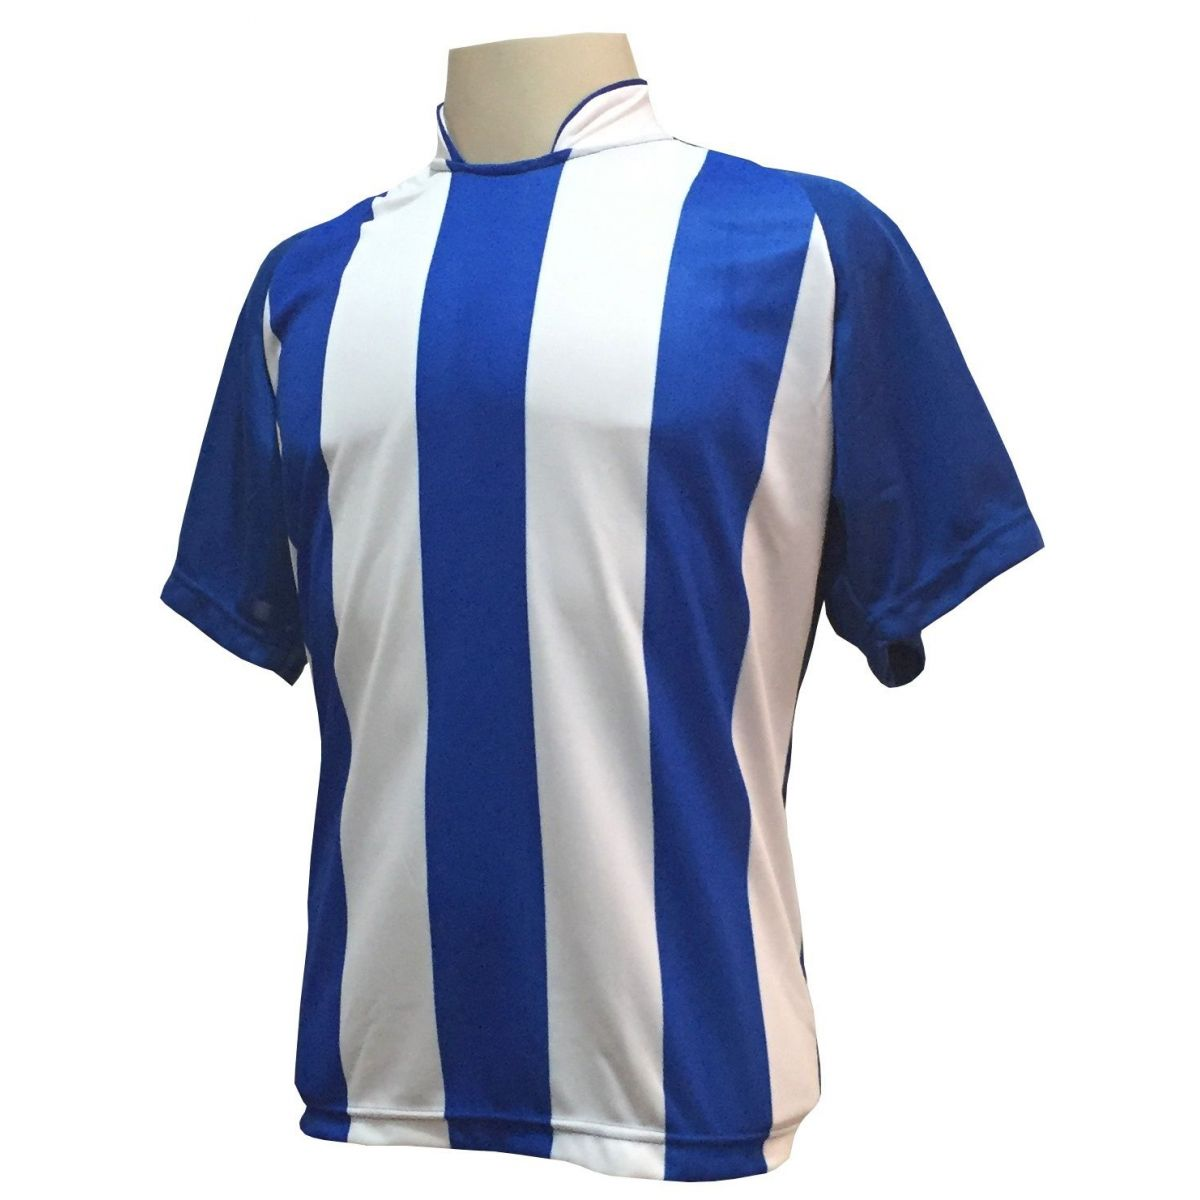 Jogo de Camisa com 18 unidades modelo Milan Royal/Branco